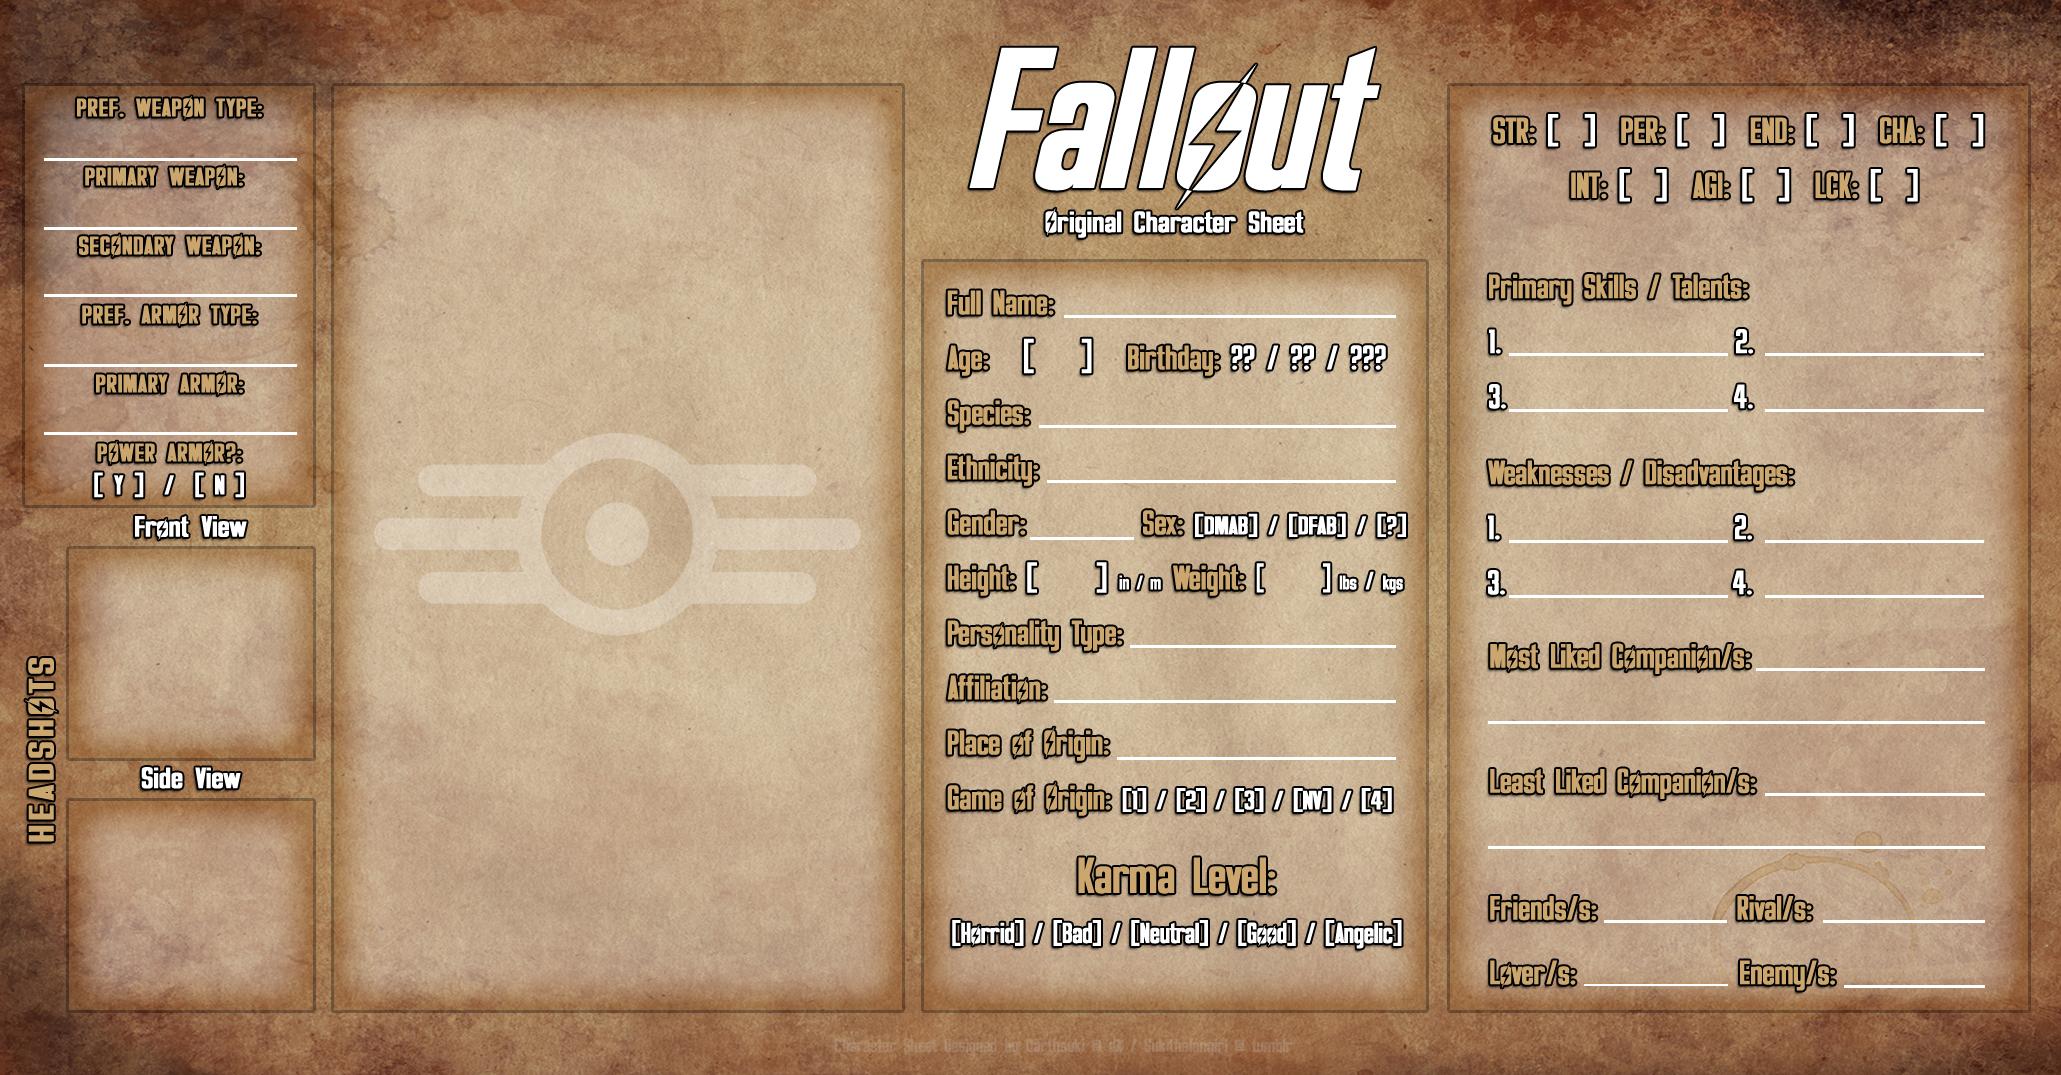 Fallout OC Meme 2.0 (Grunge Paper Ver.) by DarthSuki